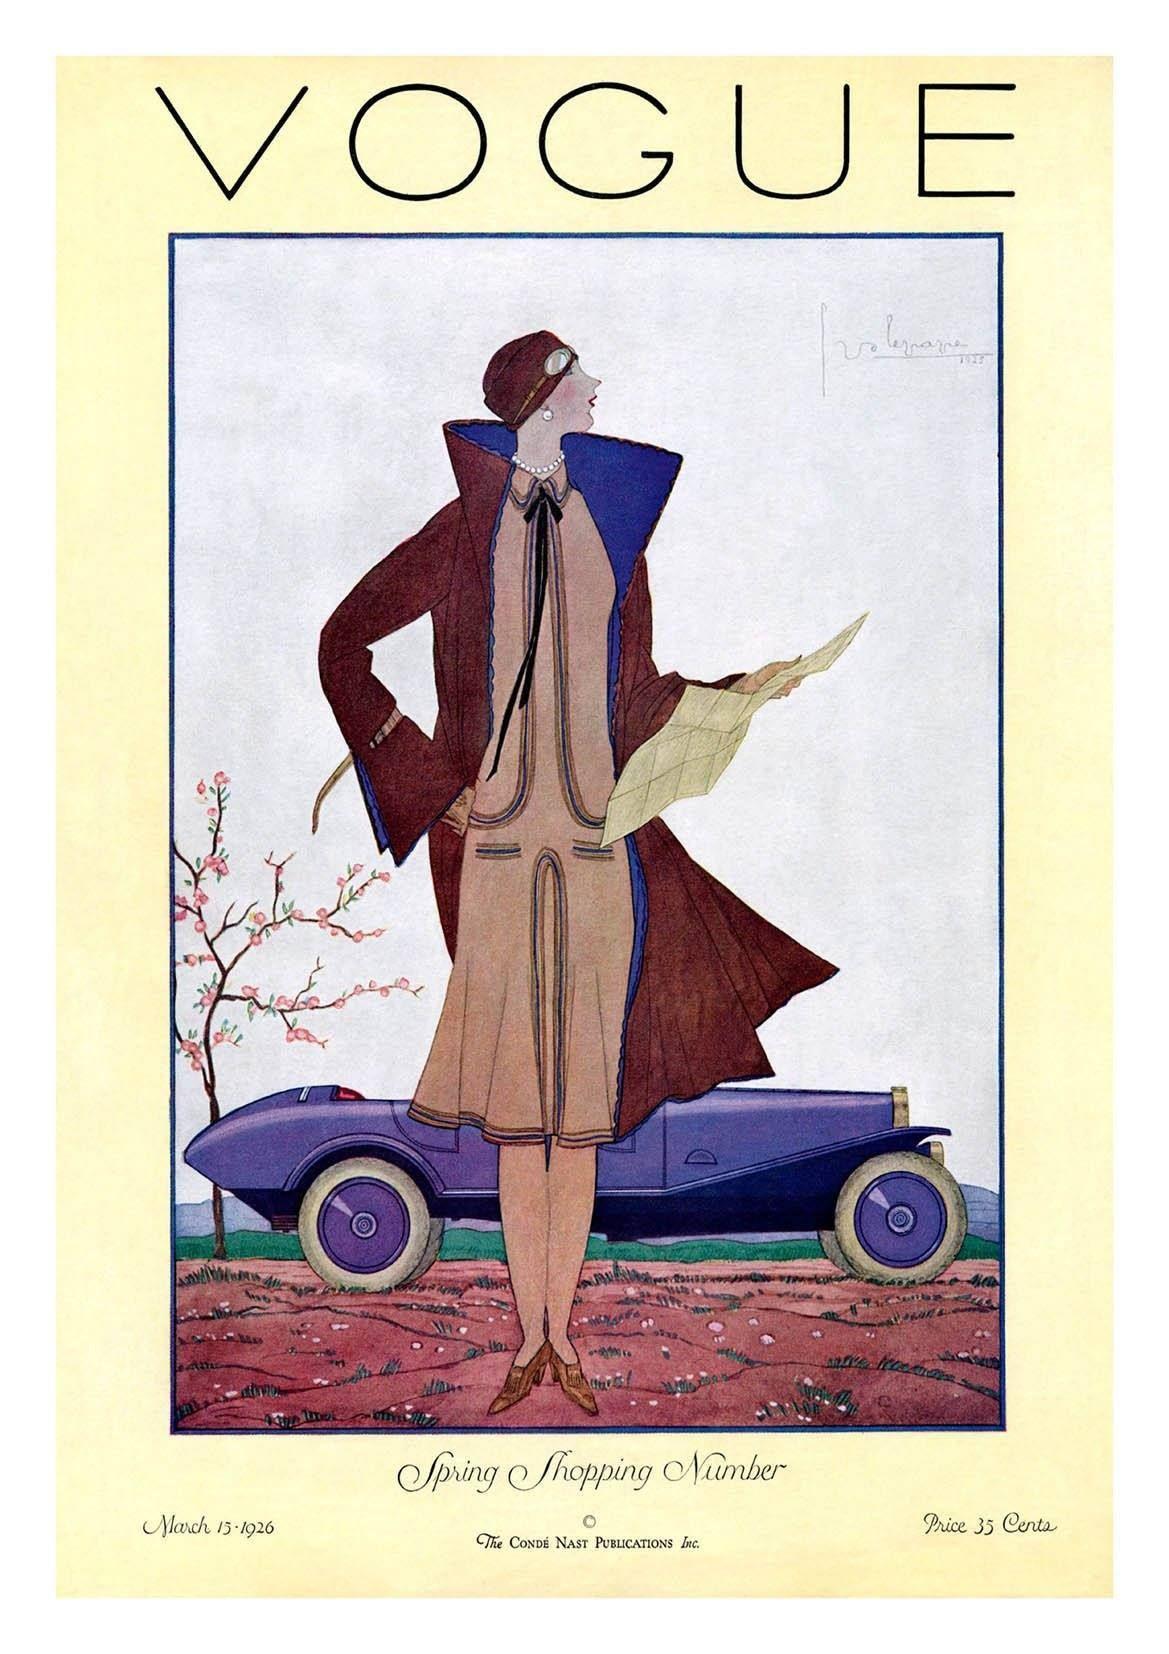 Vogue Vintage Posters For Sale